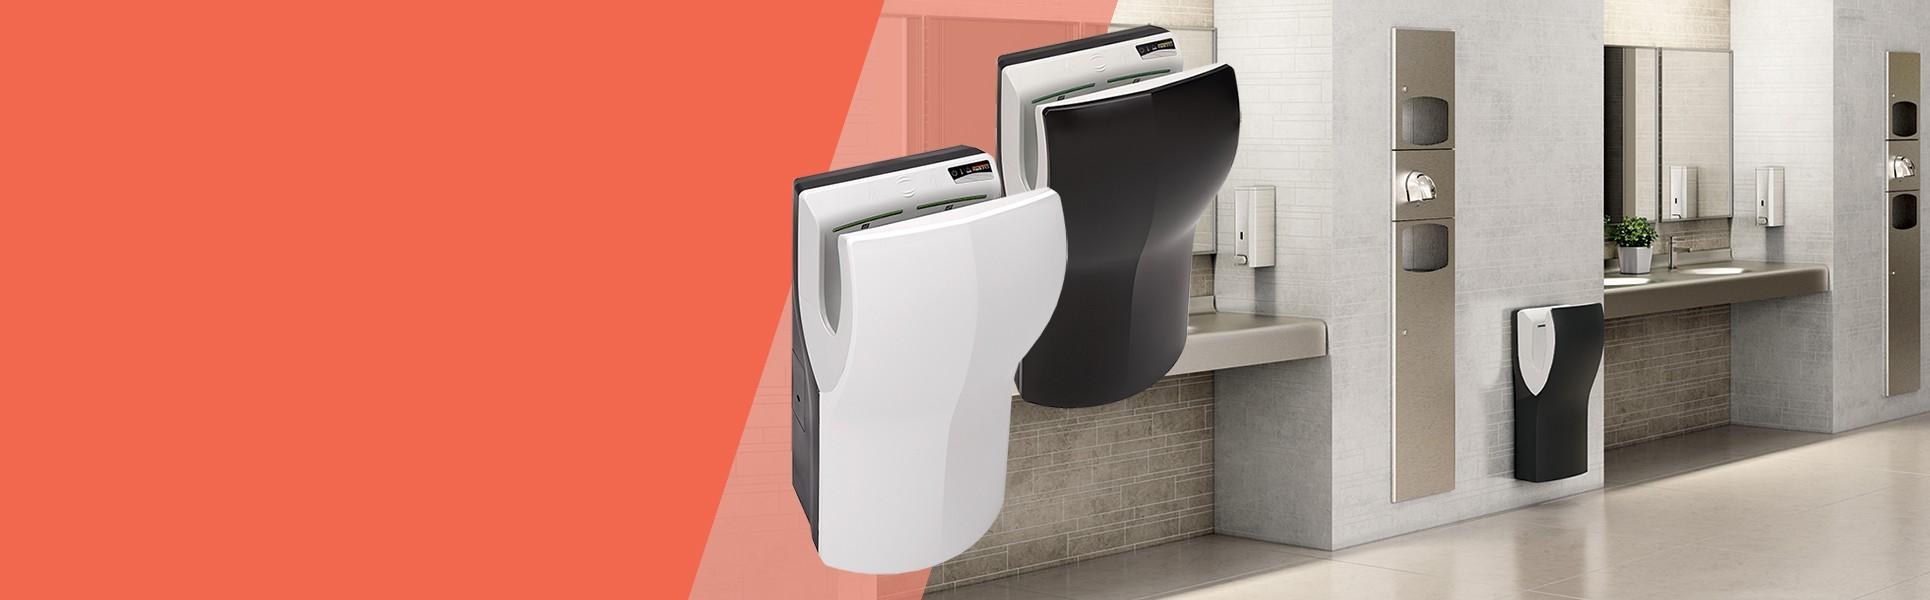 Nuevo-secador-manos-dual-flow-plus-brushless